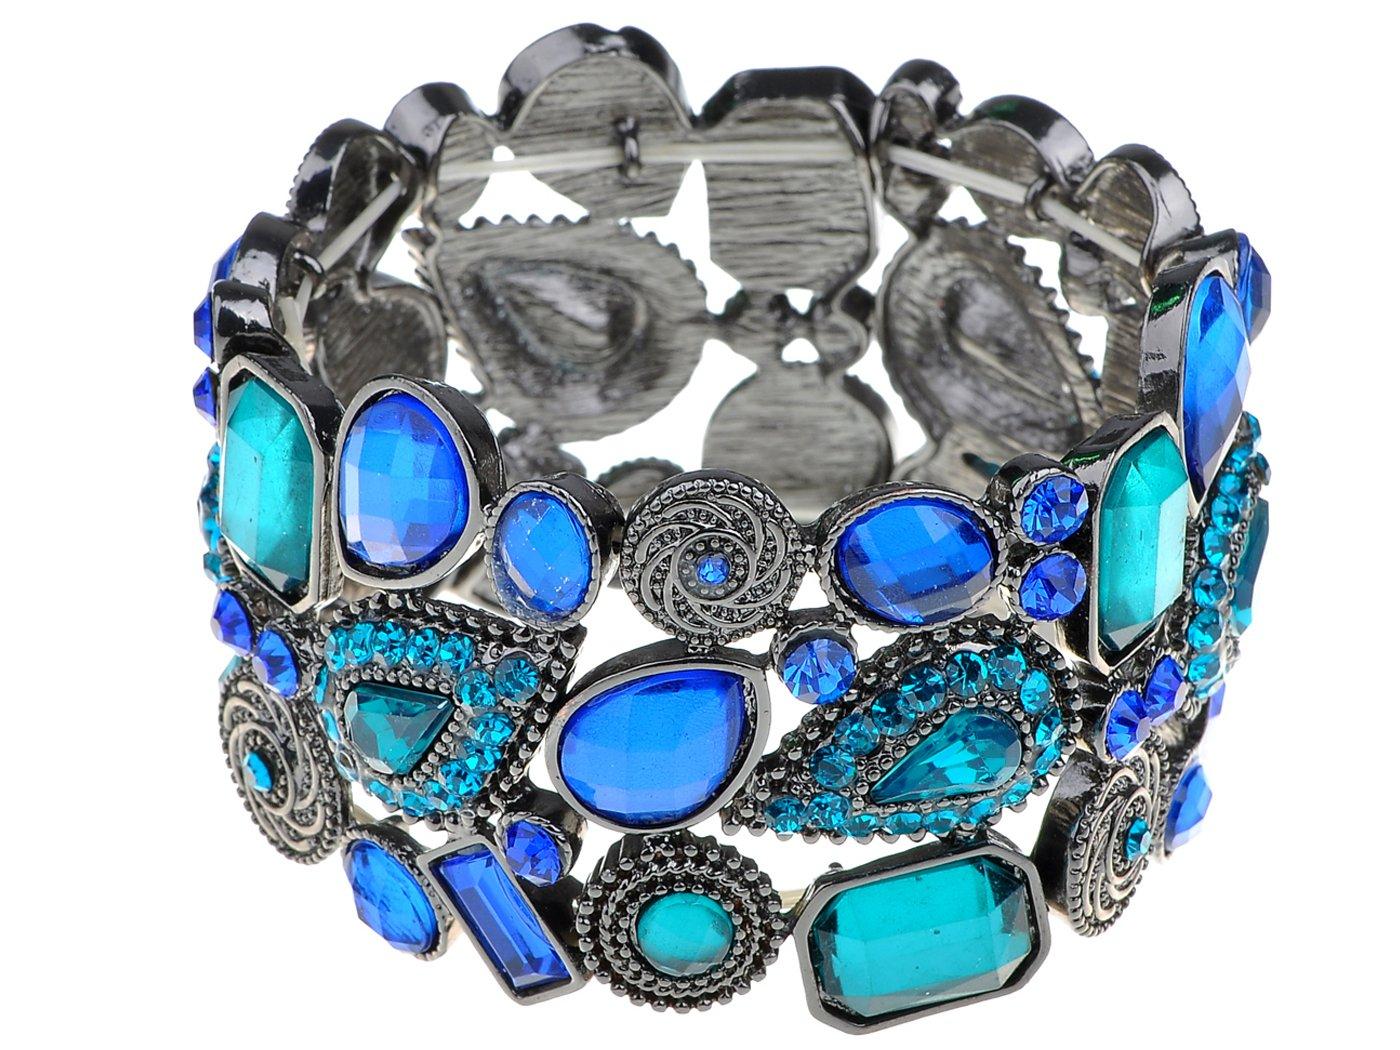 Alilang Antique Silvery Tone Blue Rhinestones Adjustable Stretch Cuff Bangle Bracelet